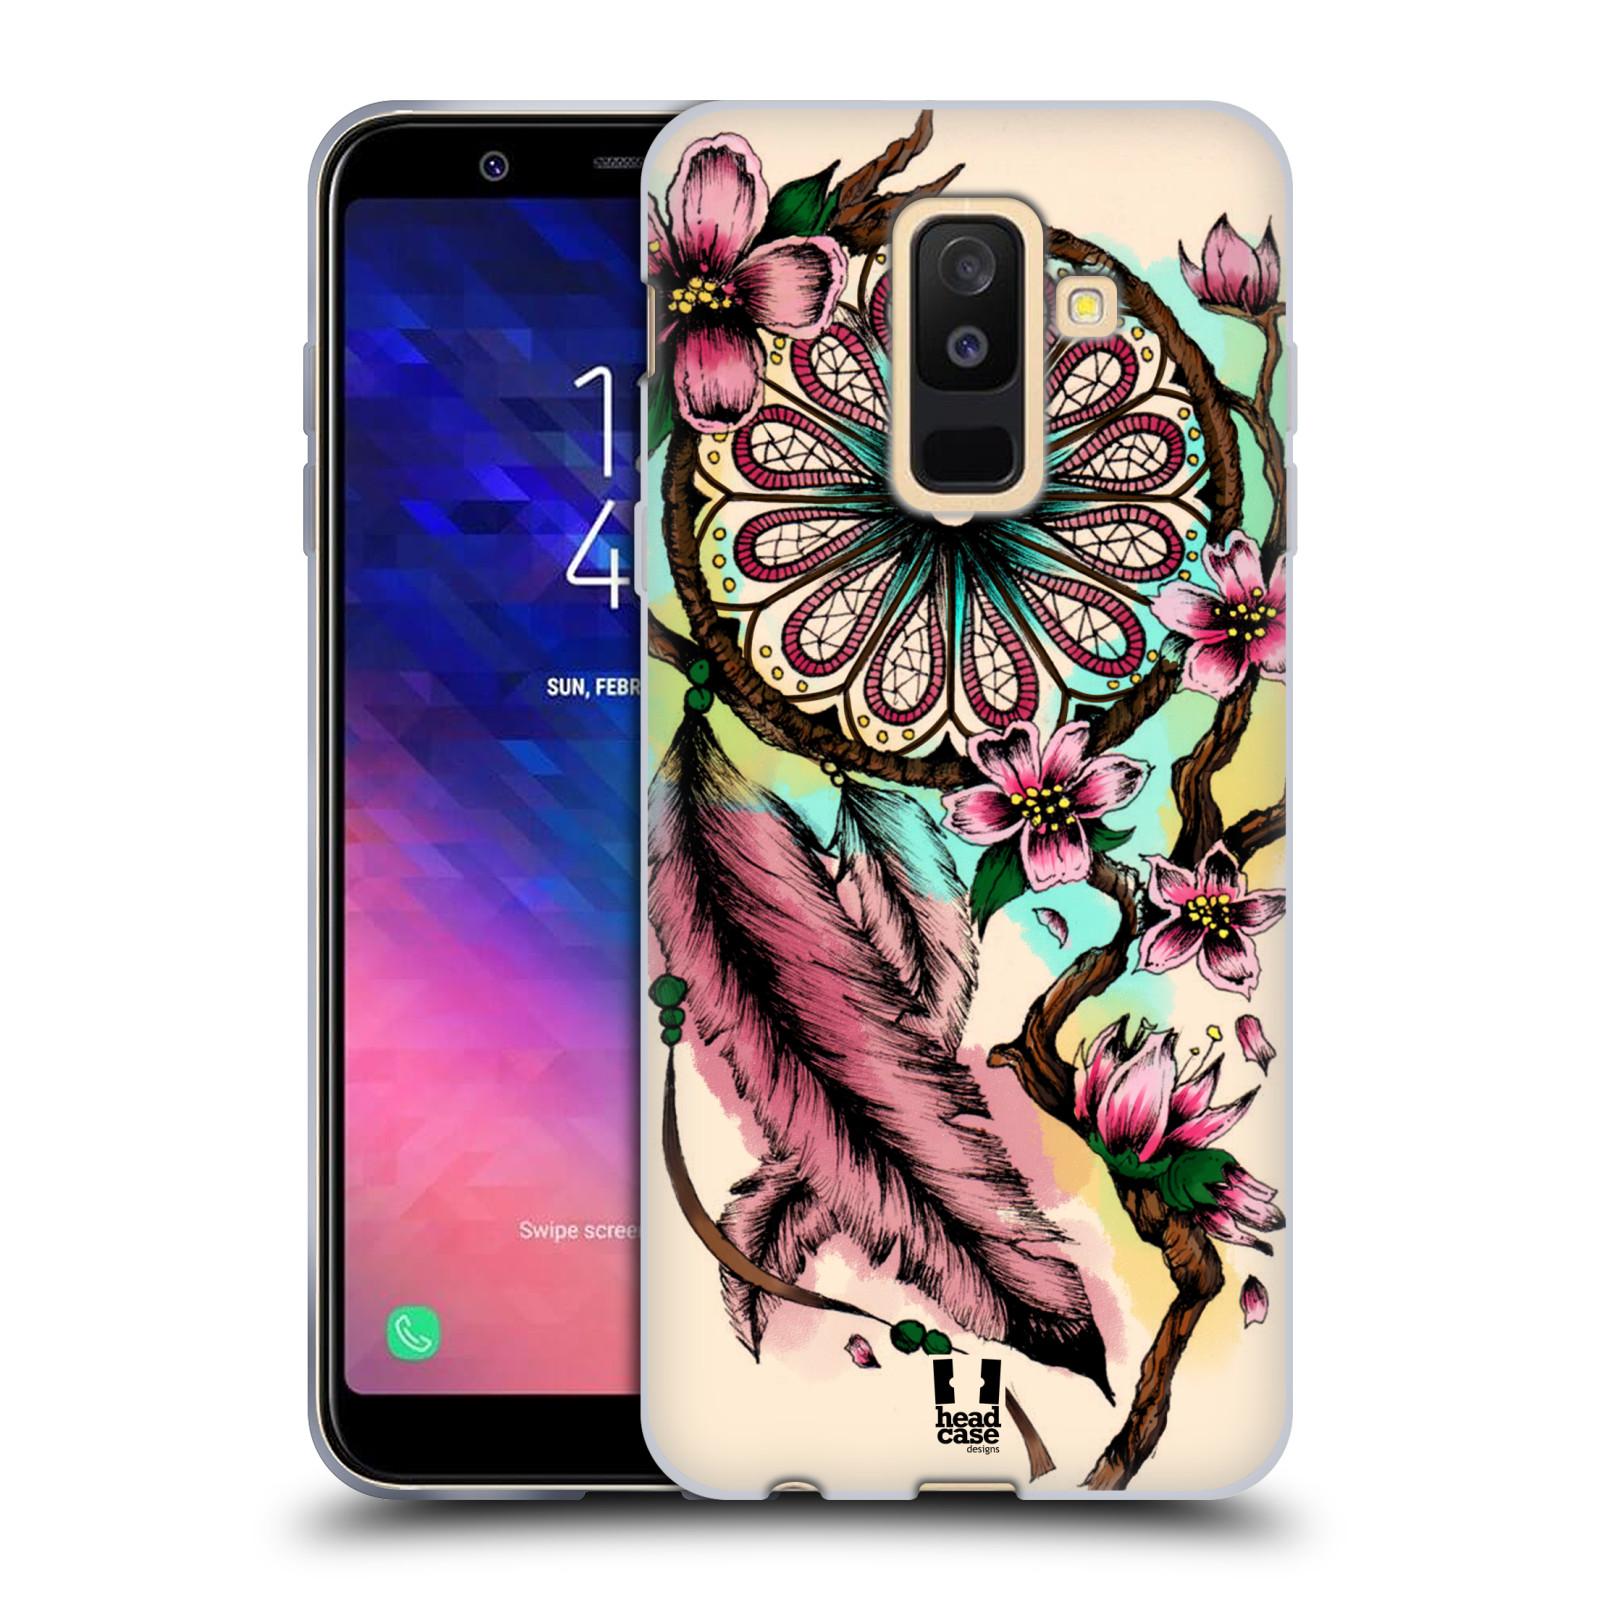 Silikonové pouzdro na mobil Samsung Galaxy A6 Plus (2018) - Head Case - BLOOM BLOSSOMS